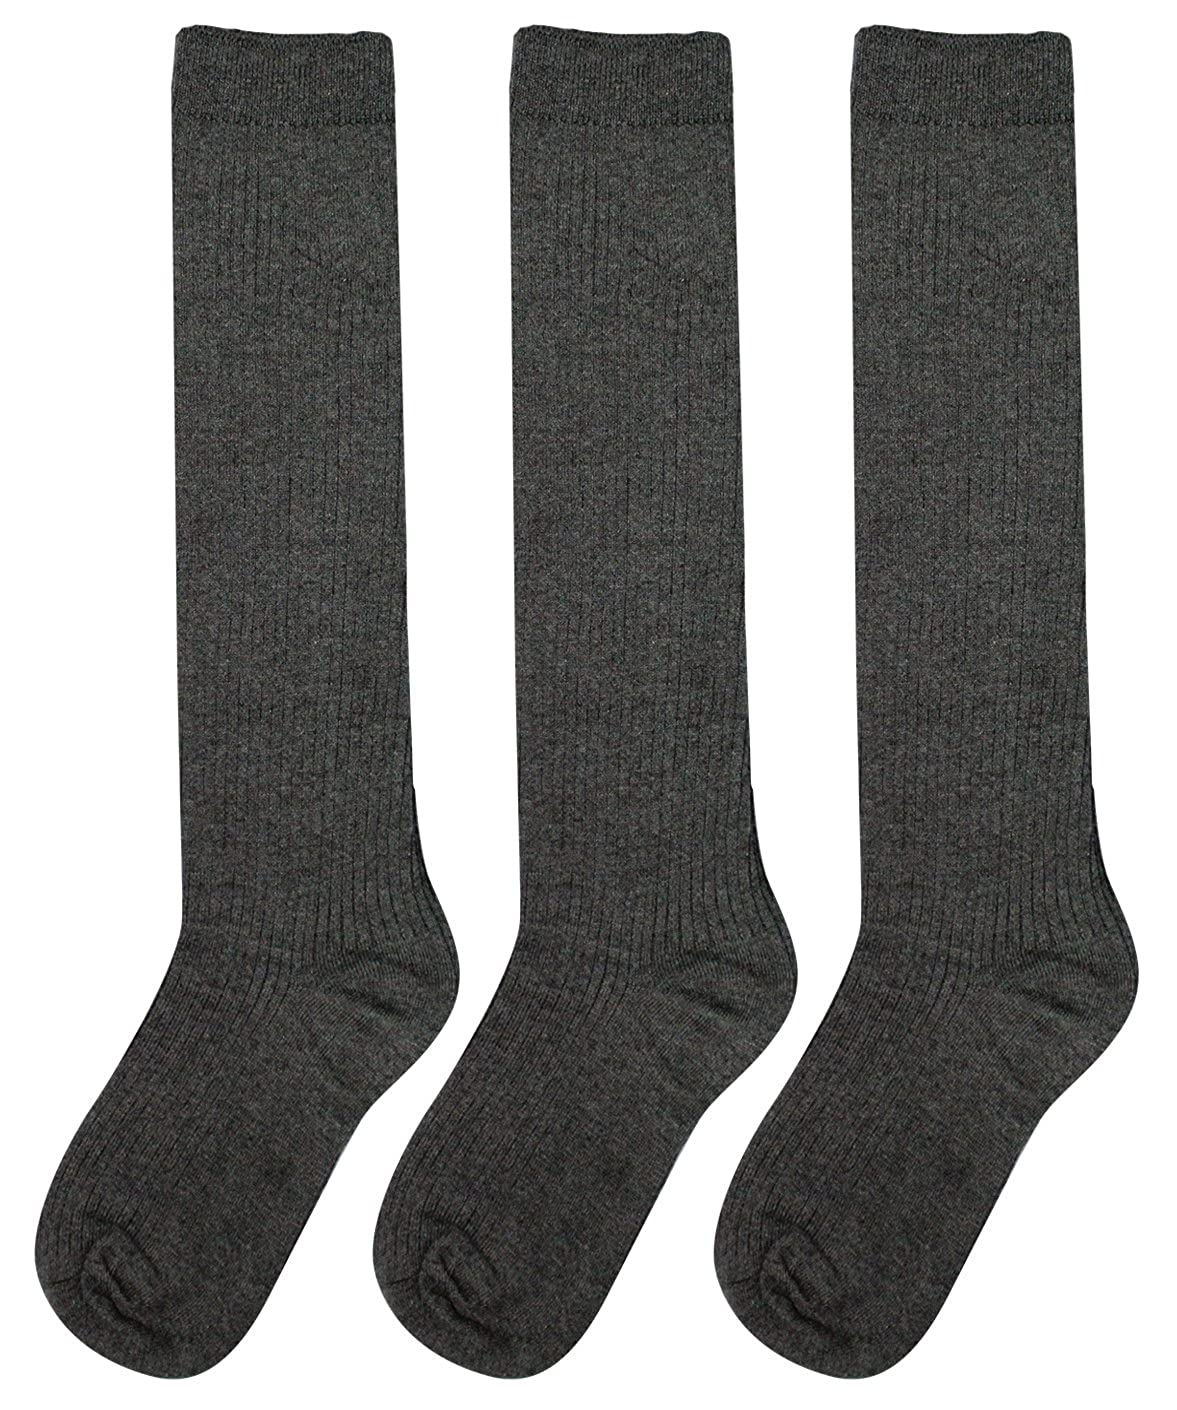 Big Girls School Uniform Knee-High Socks 3-pack